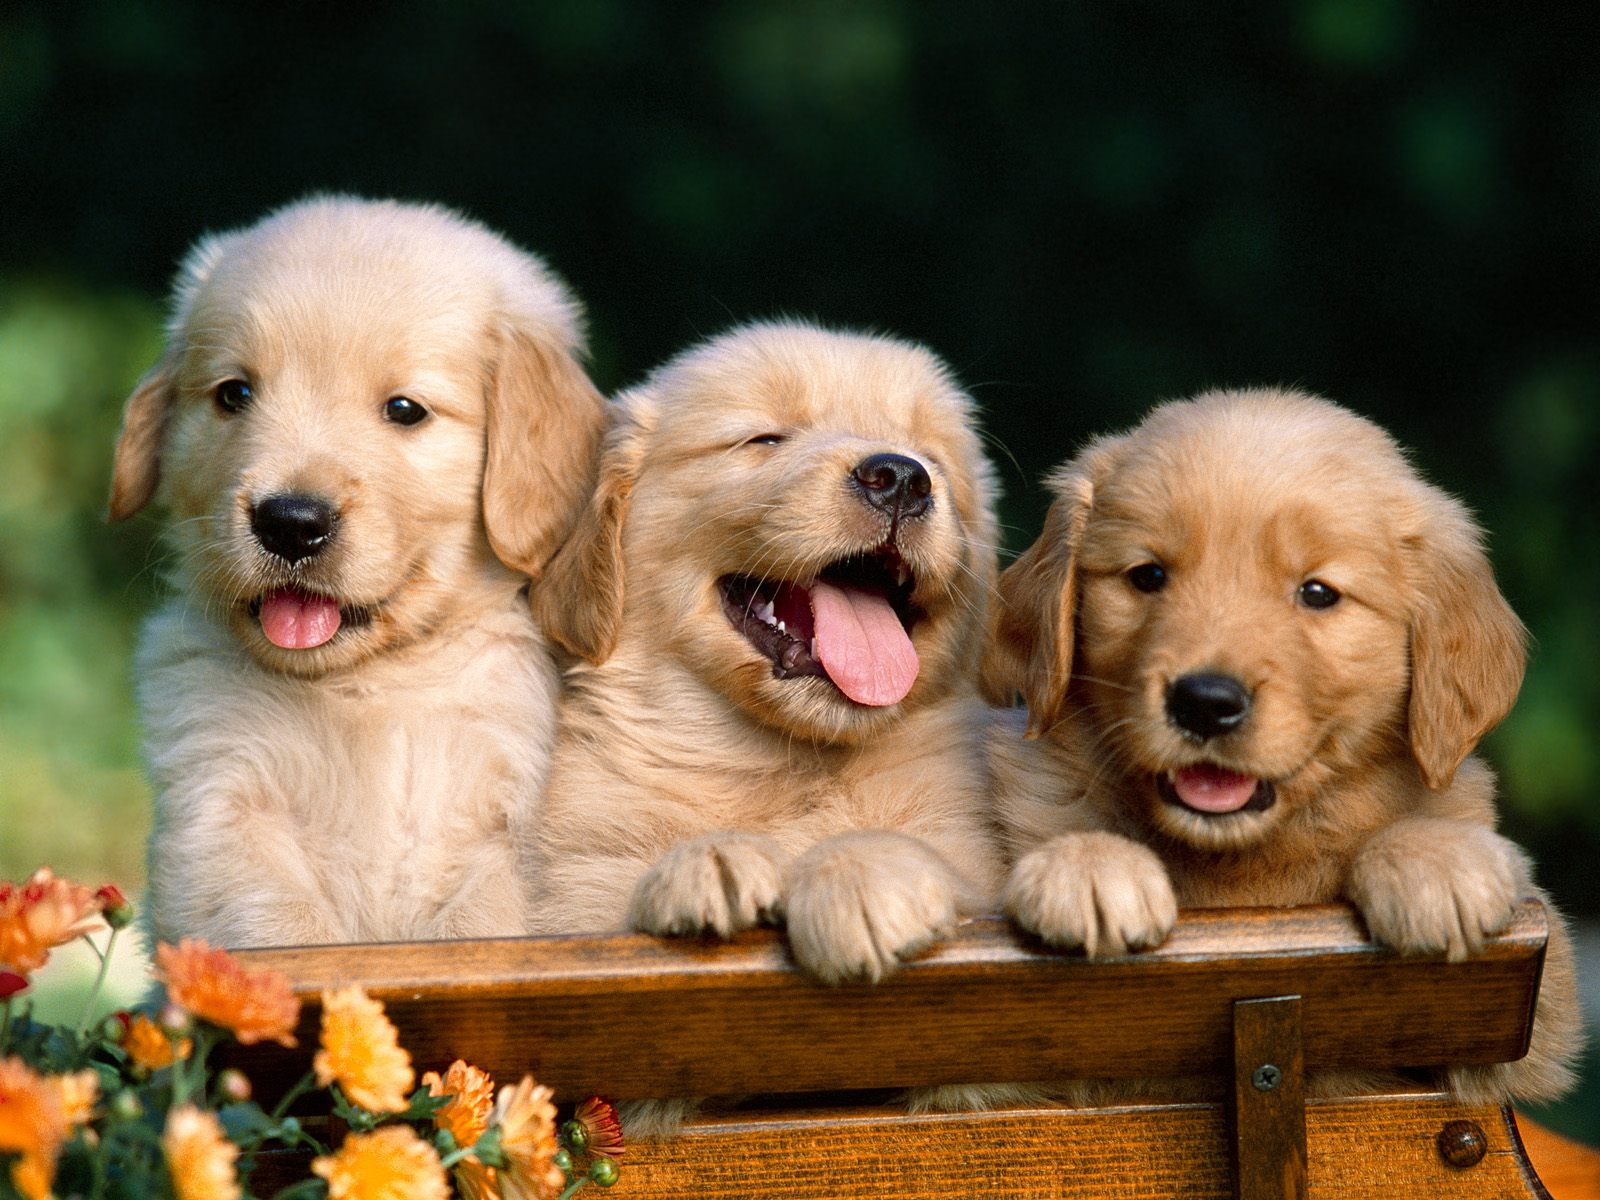 http://2.bp.blogspot.com/---dRZtjDTvc/TjWjK1FLc1I/AAAAAAAAAHM/su4VetUkSy4/s1600/Golden_Retriever_Puppies.jpg